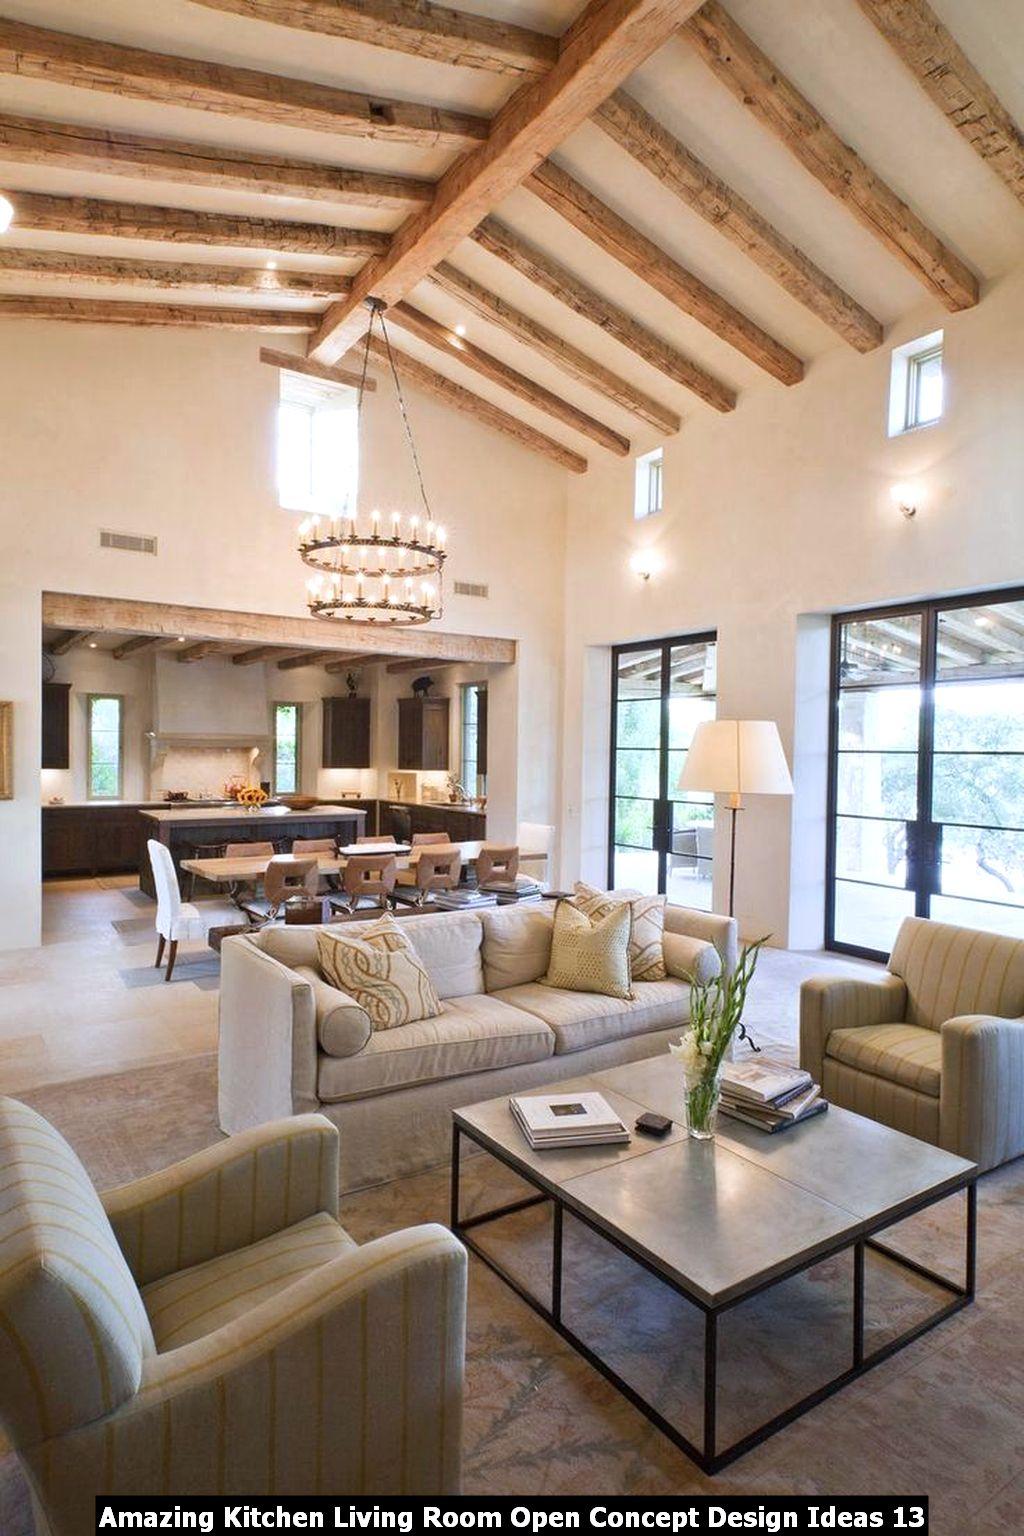 Amazing Kitchen Living Room Open Concept Design Ideas 13